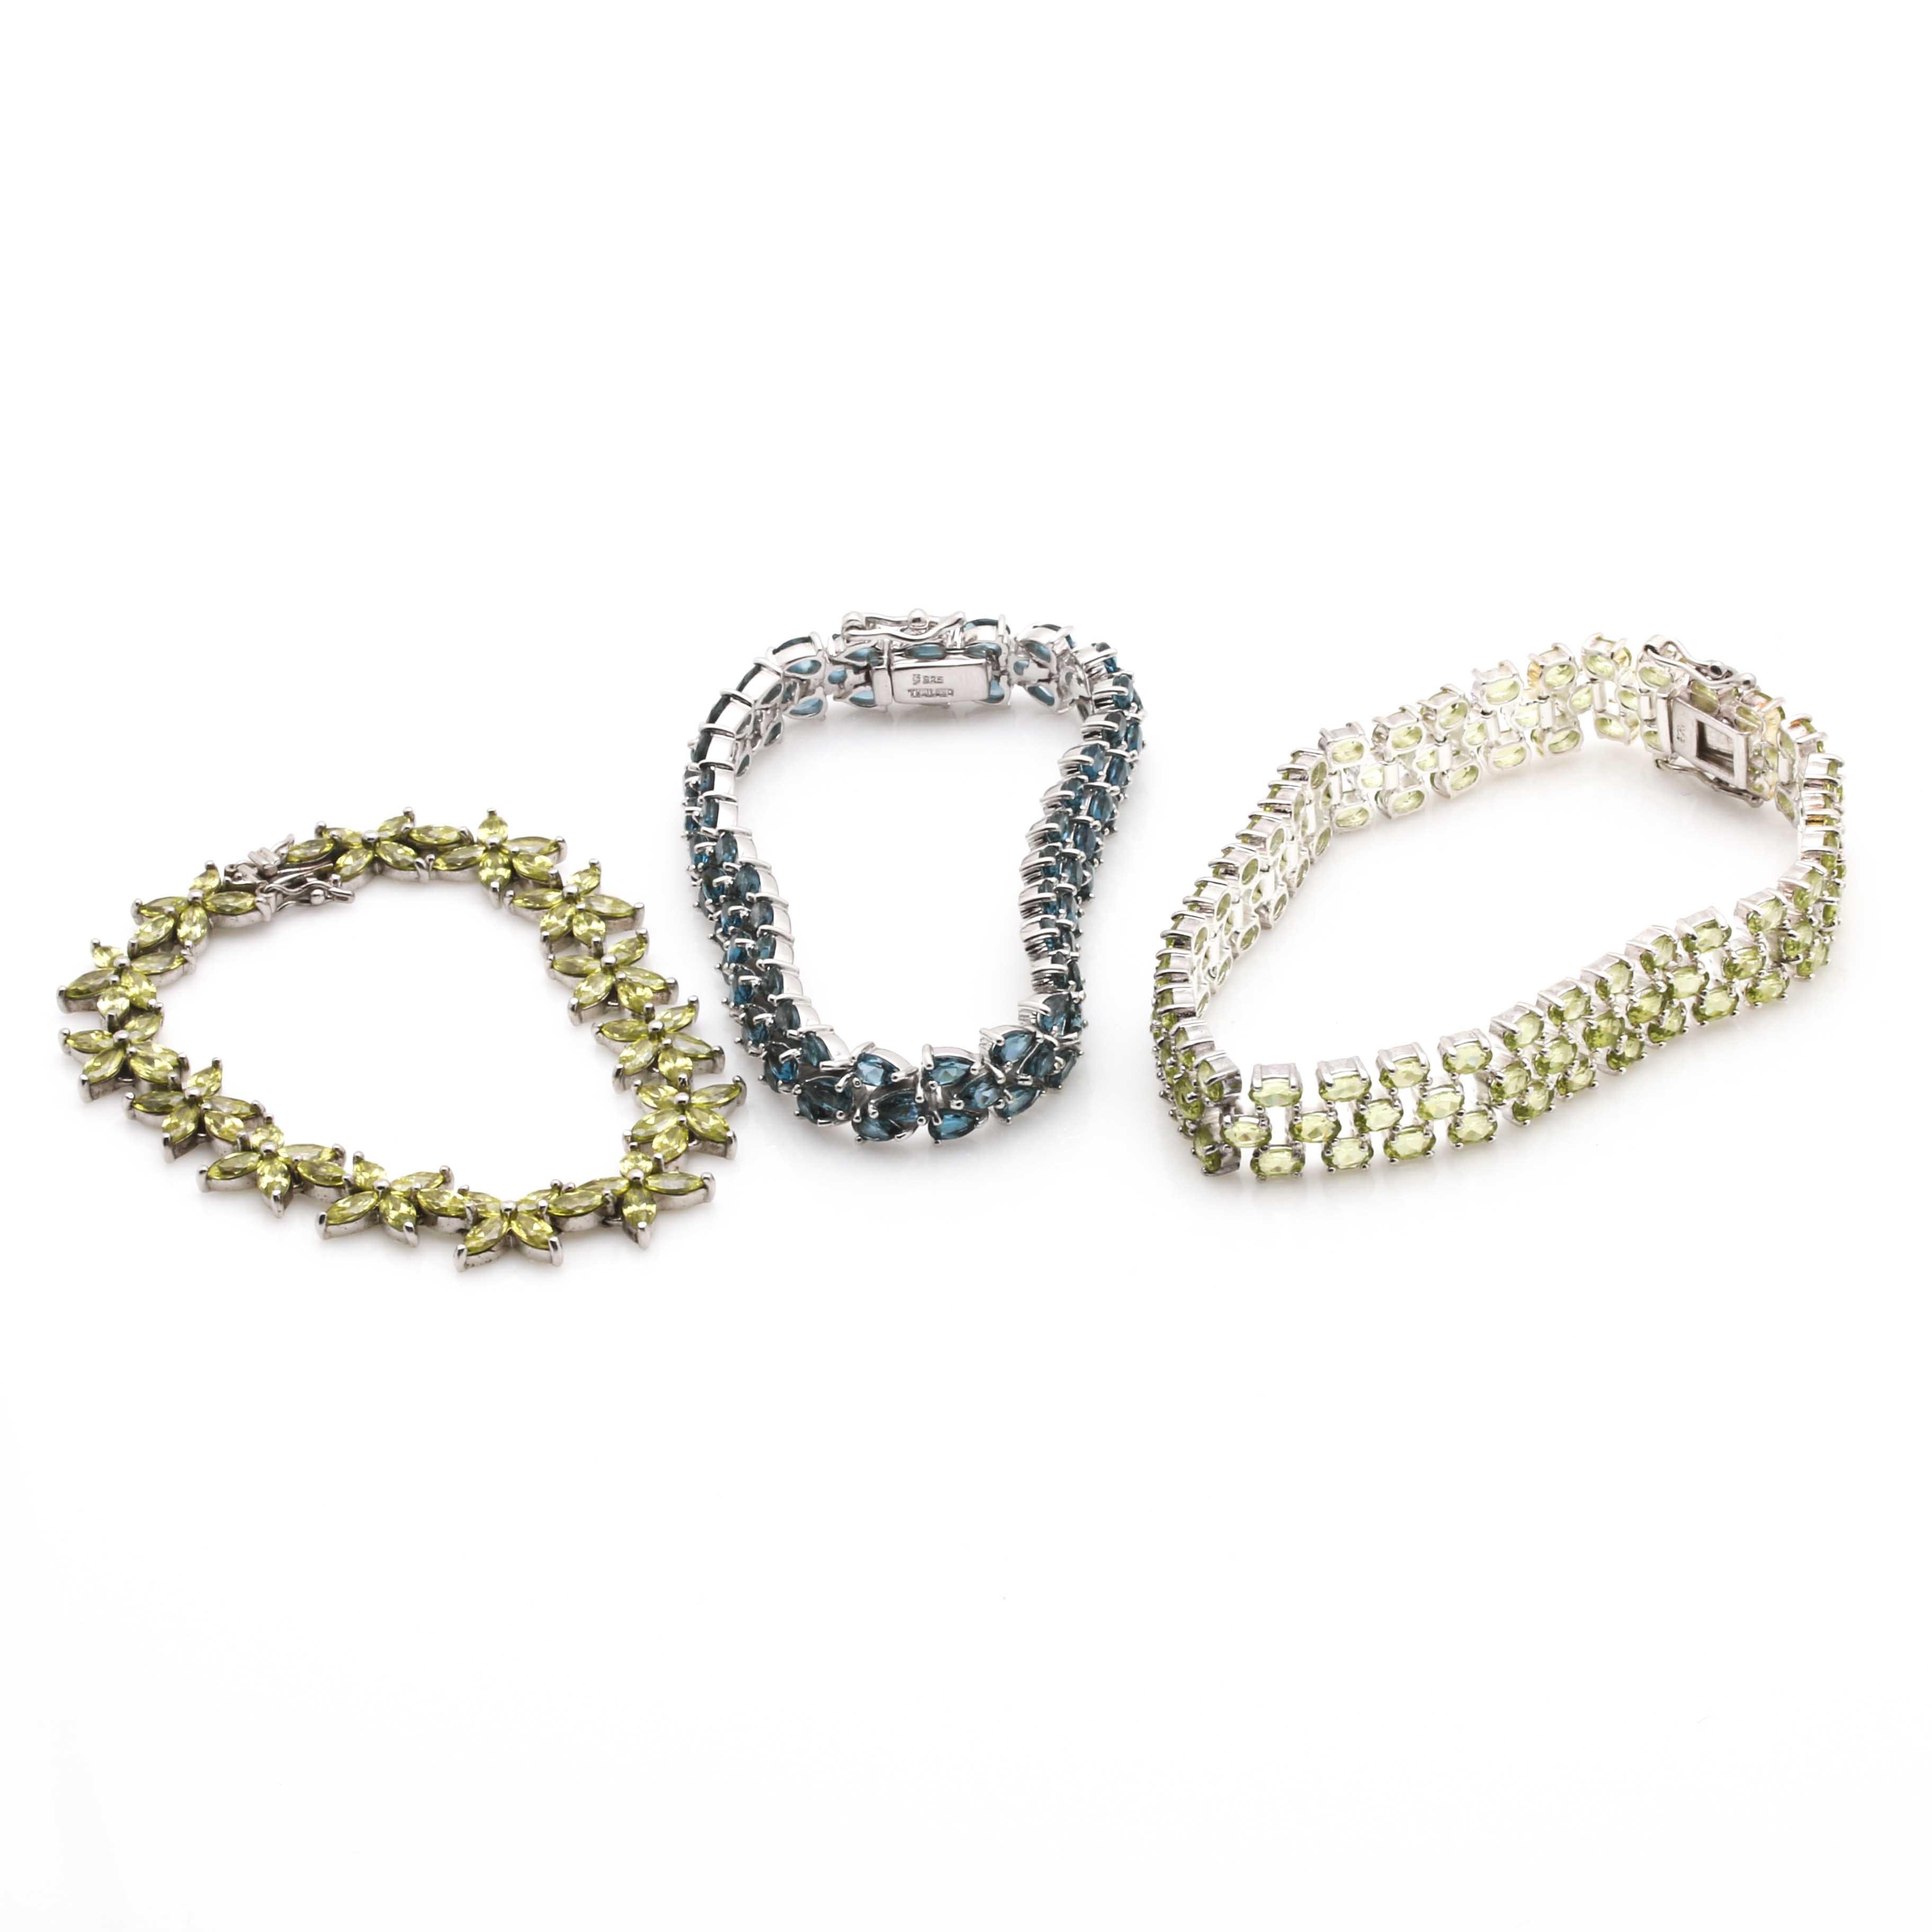 Sterling Silver Bracelets With Various Gemstones